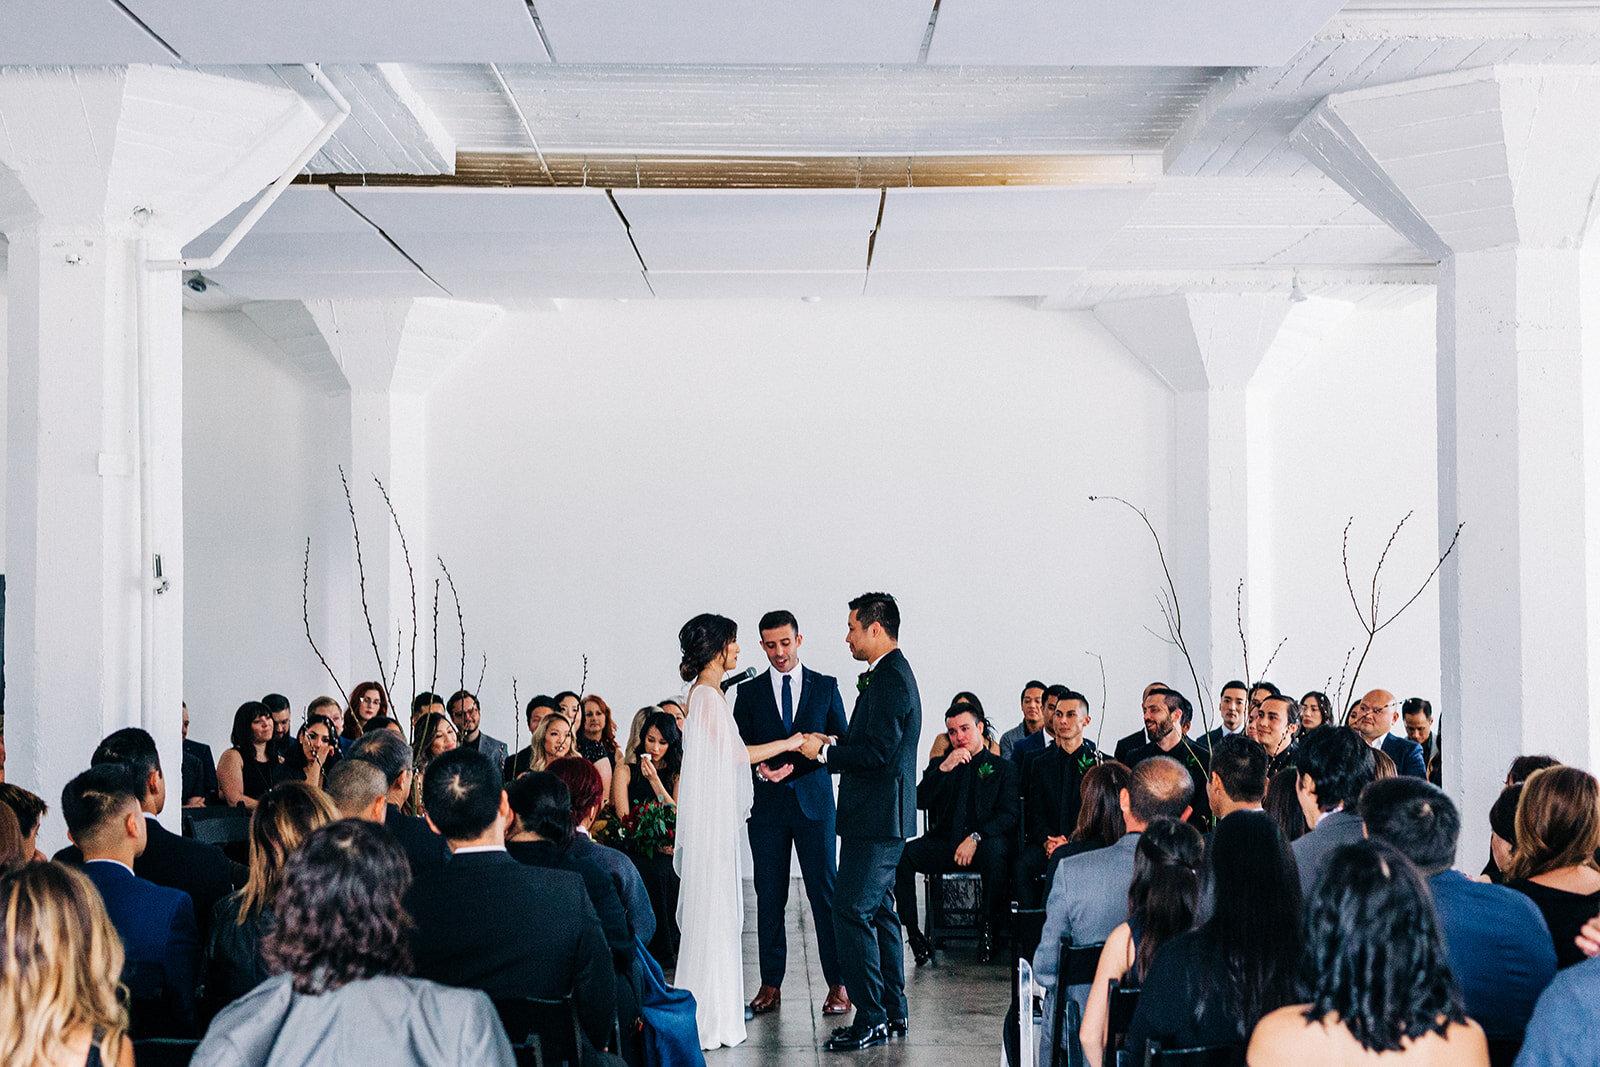 Tom-and-Christine-Hudson-Loft-Downtown-Los-Angeles-Brandon-J-Ferlin-Wedding-Photography-338.jpg